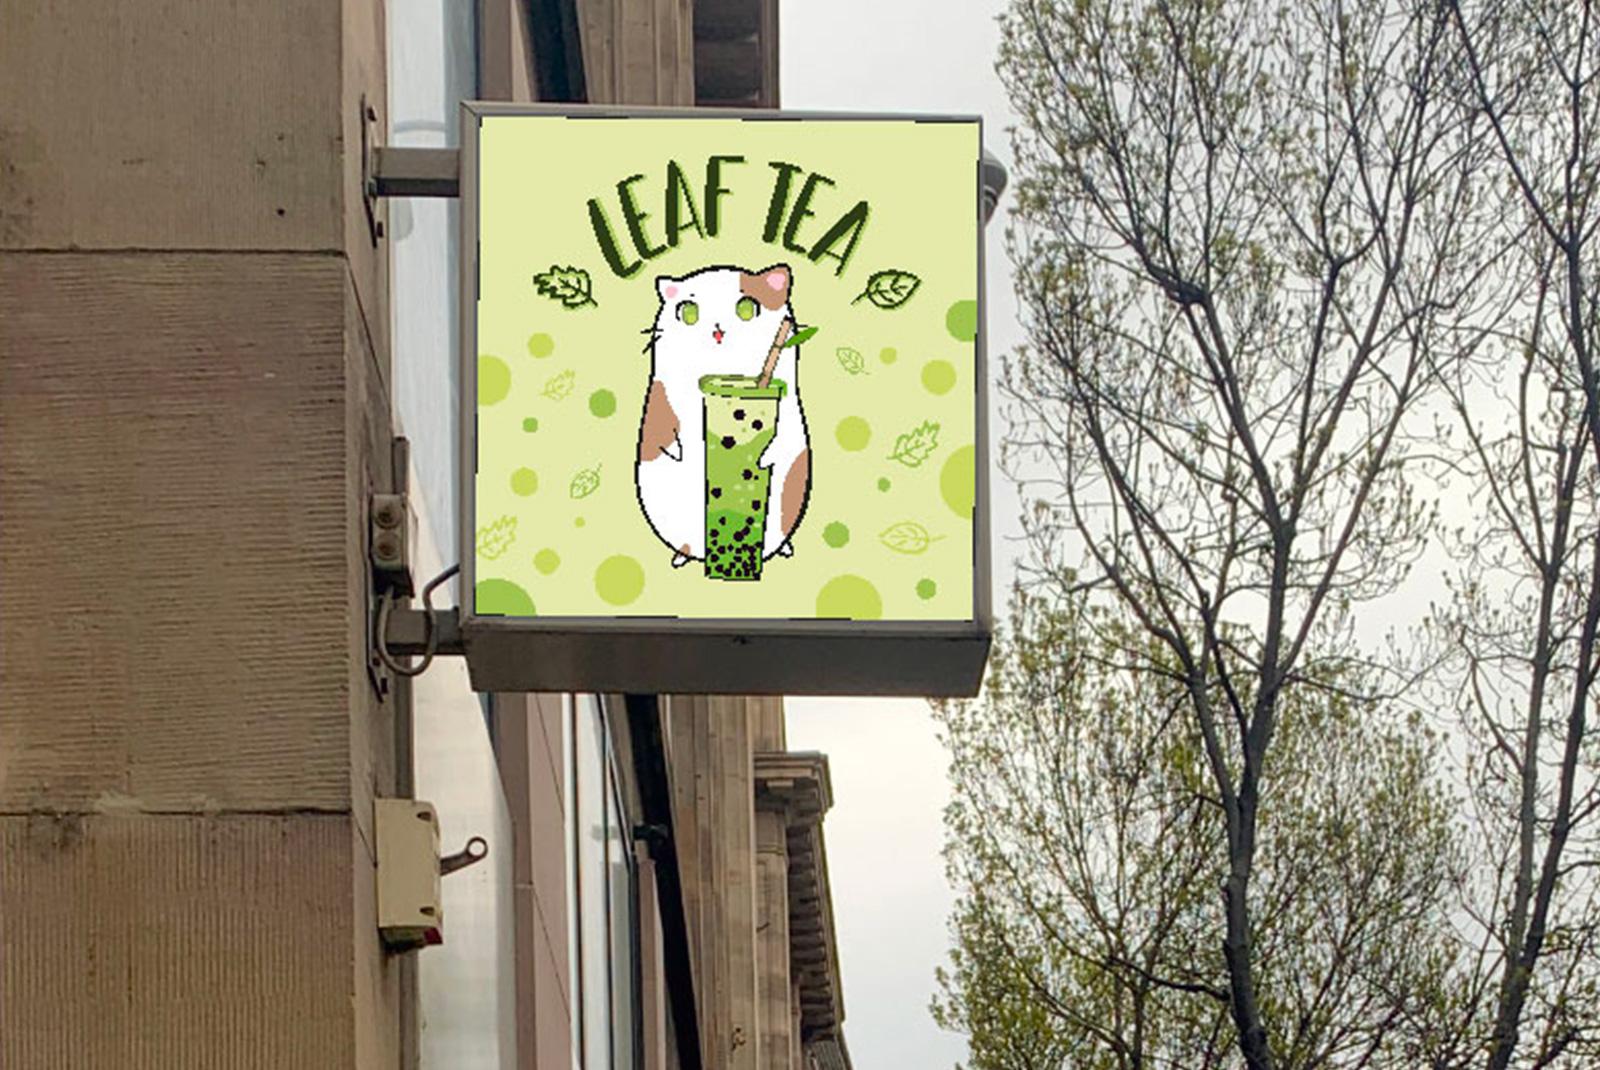 Signalétique enseigne LEAF TEA